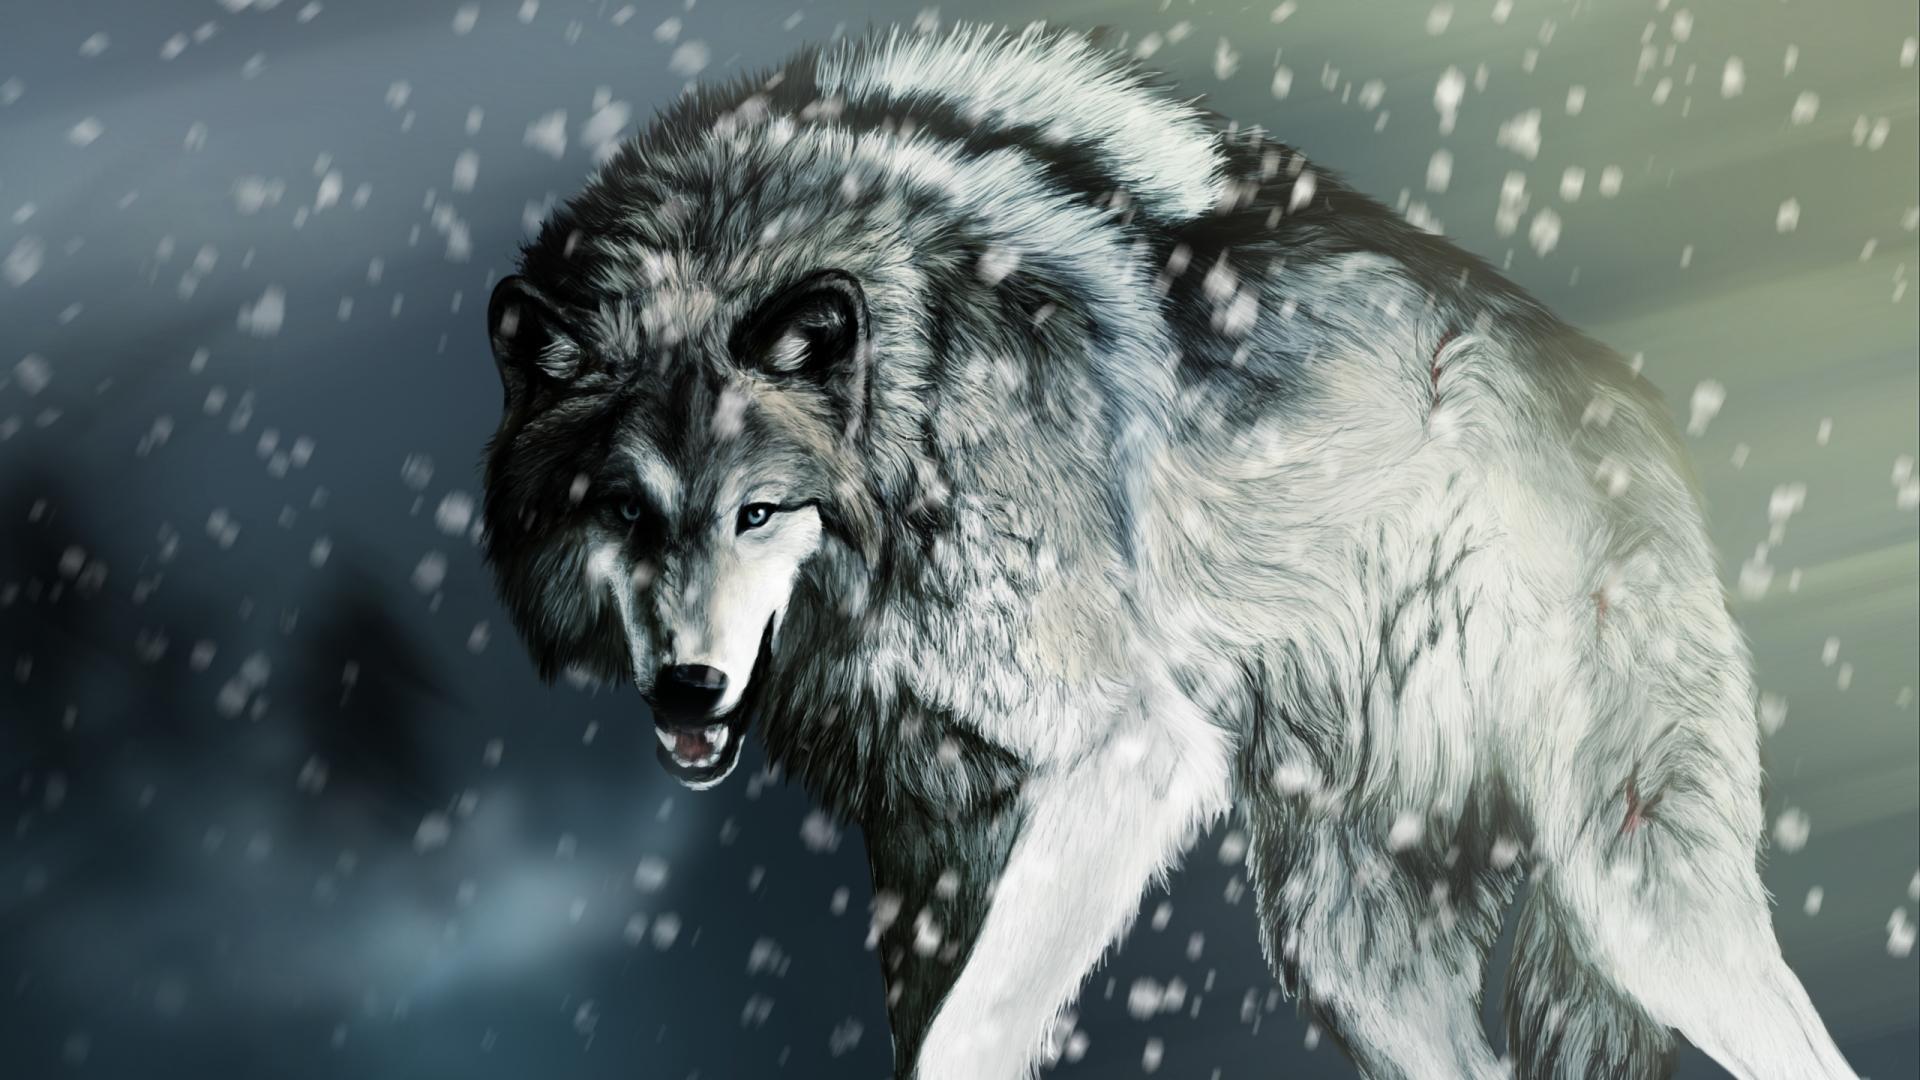 152 Werewolf HD Wallpapers | Backgrounds - Wallpaper Abyss